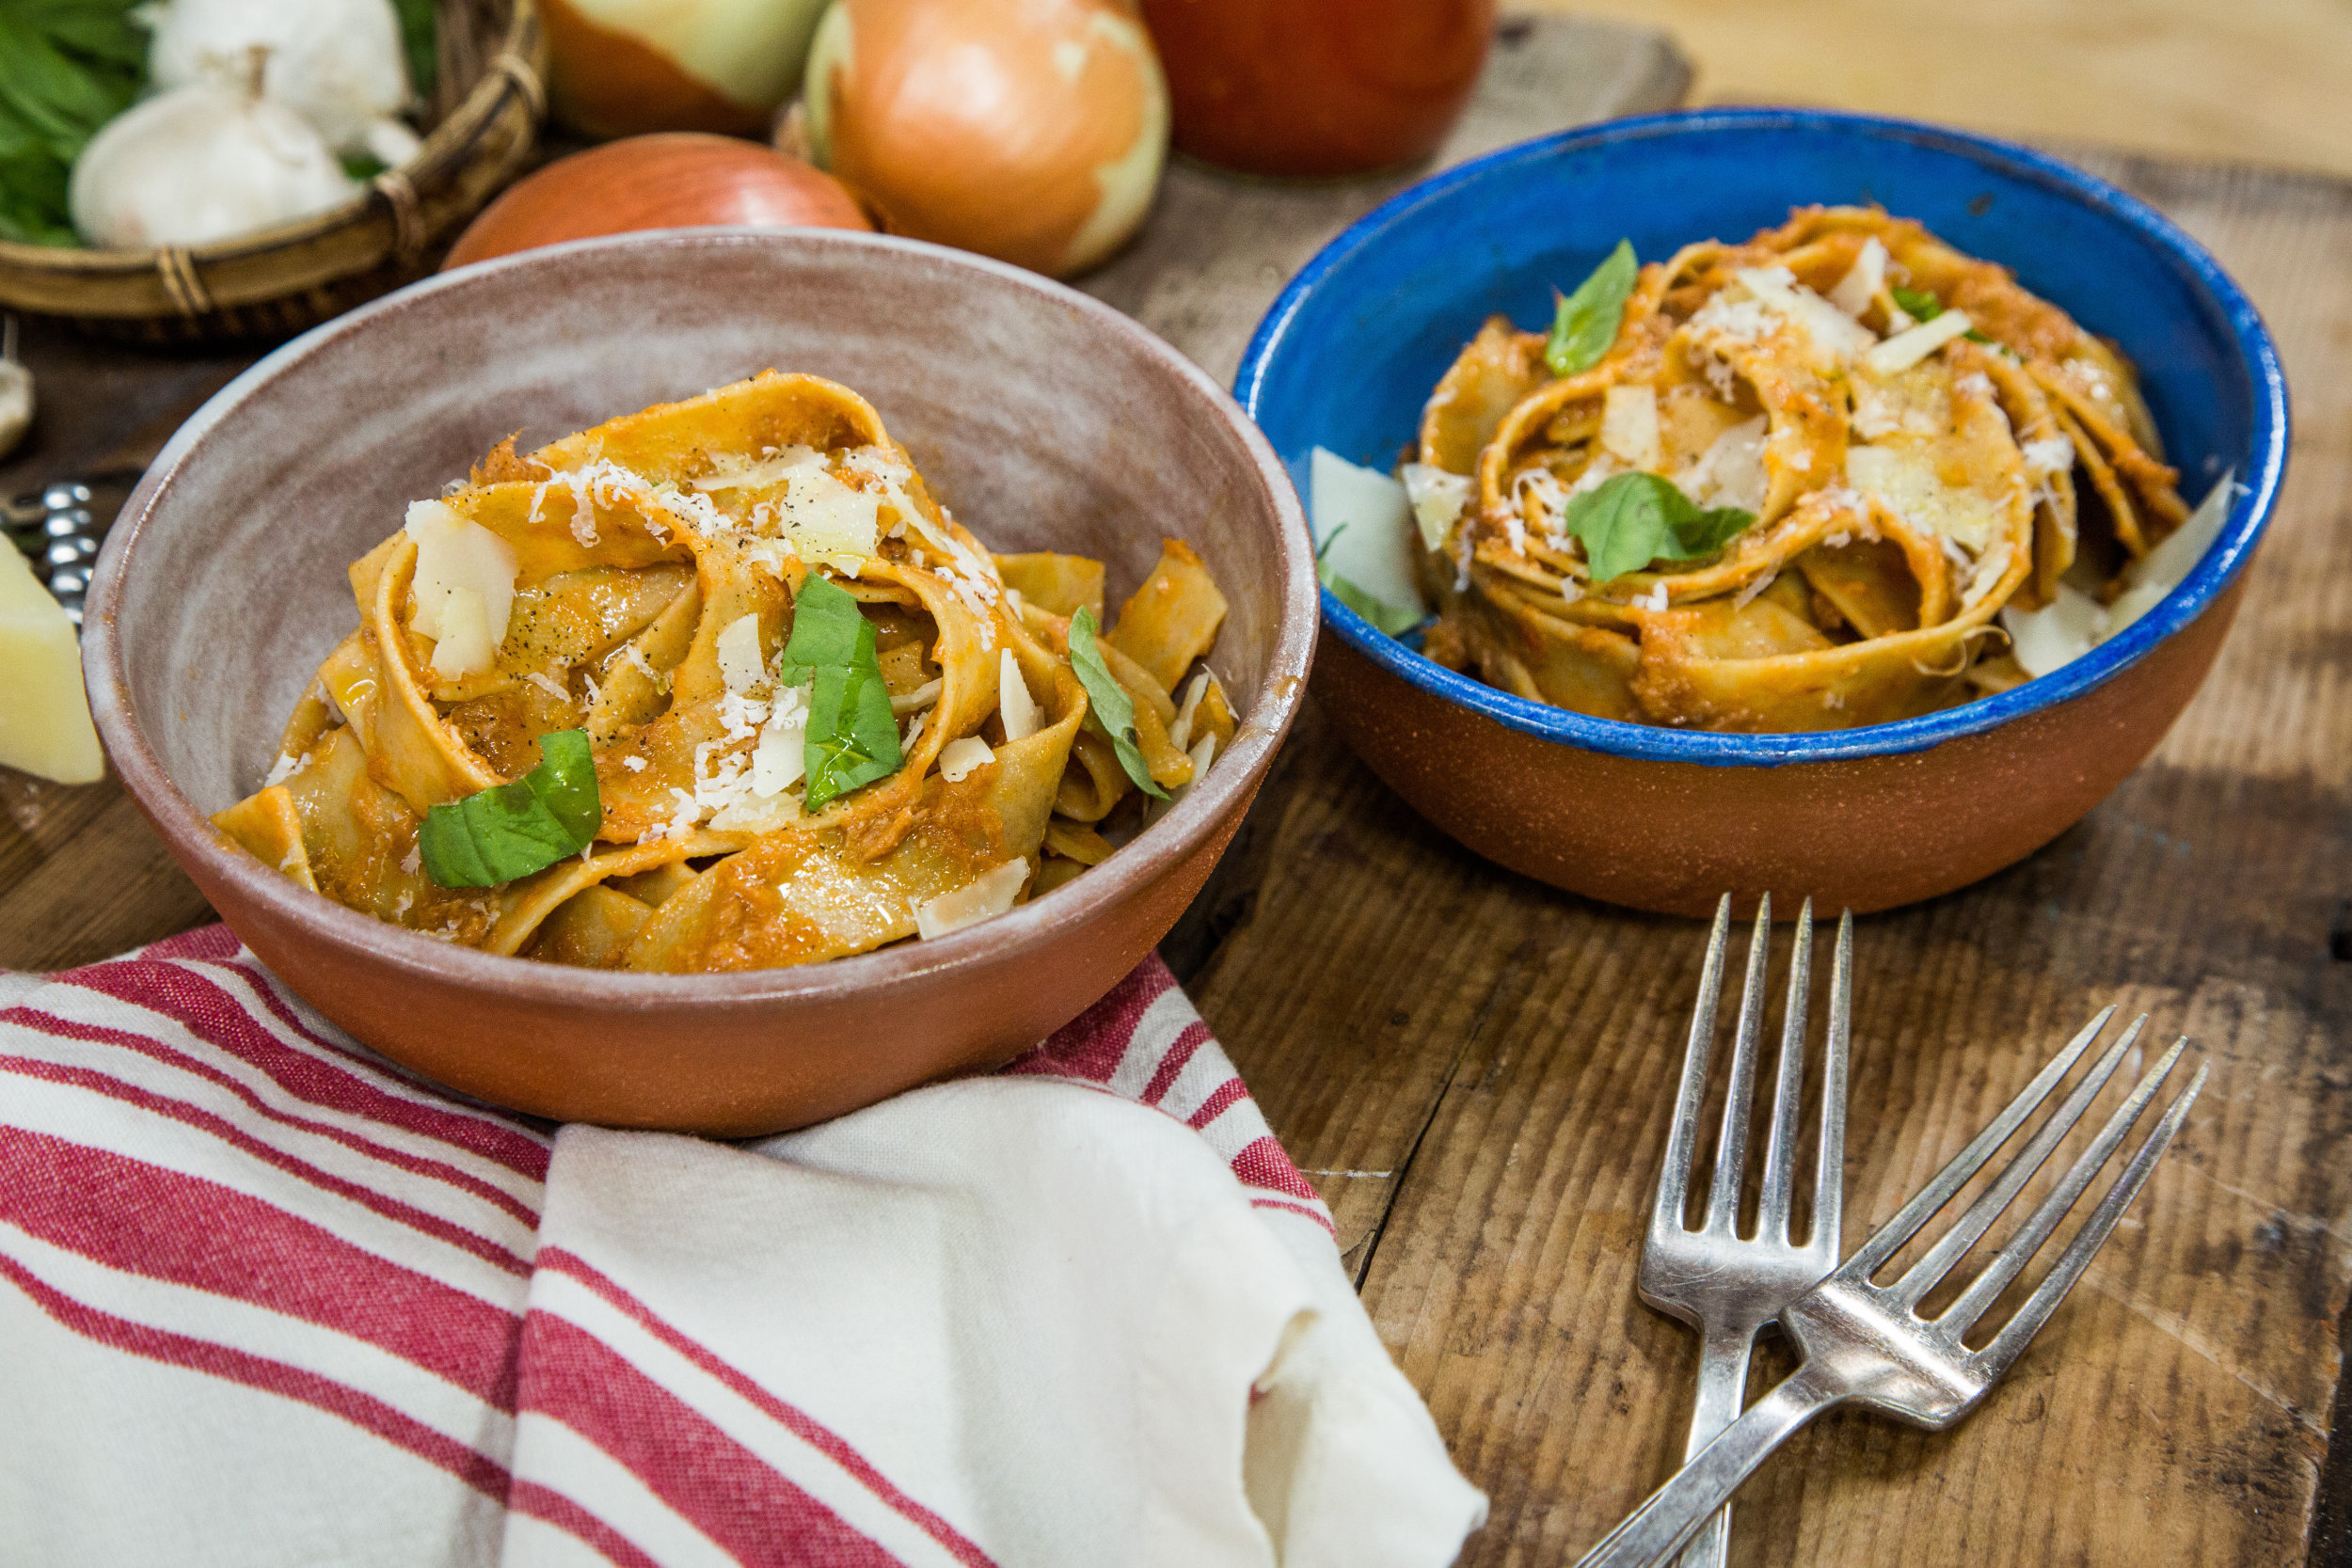 Recipes - Pork and Beef Ragu | Home & Family | Hallmark Channel